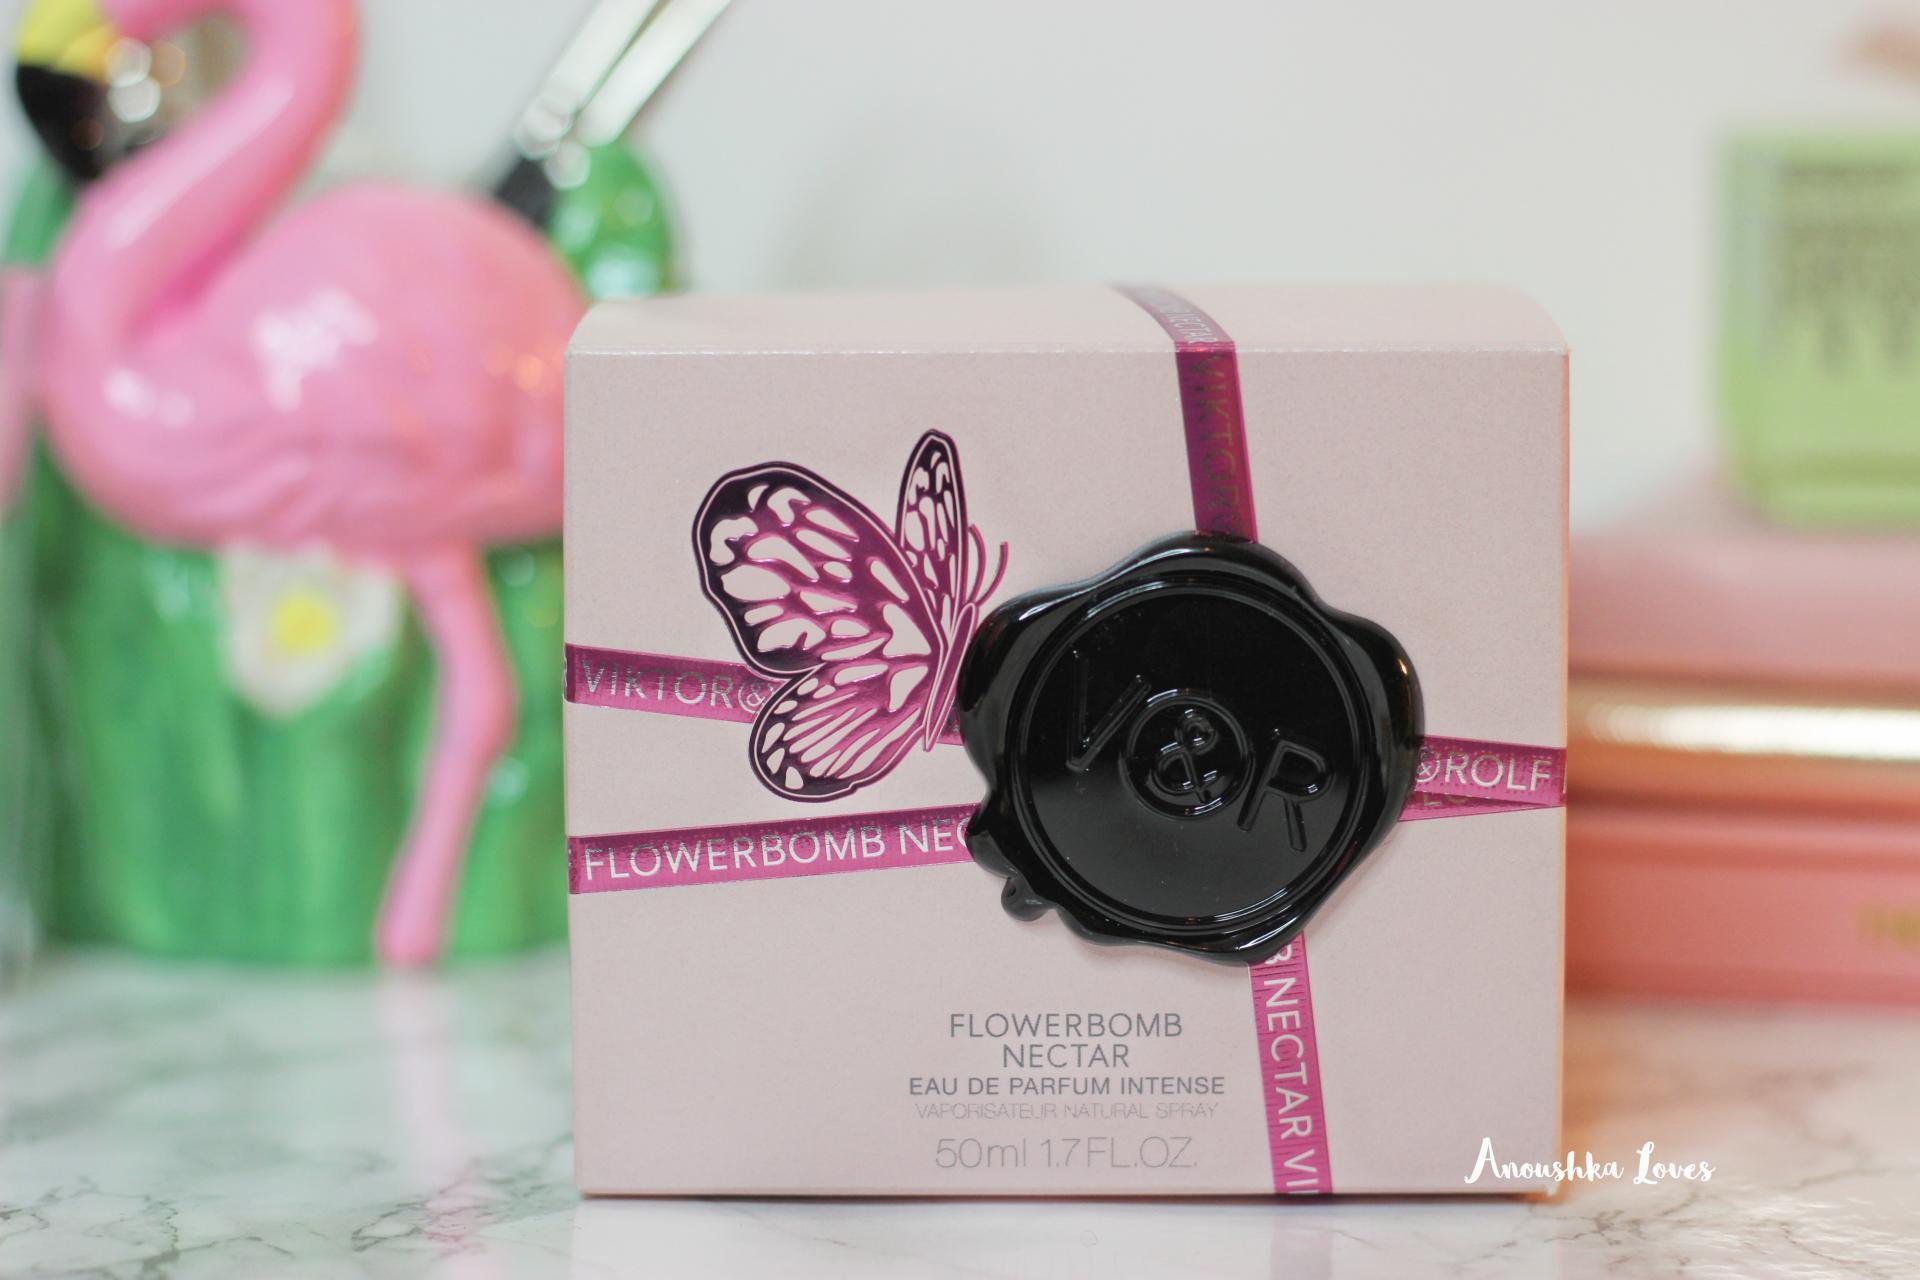 Flowerbomb Nectar